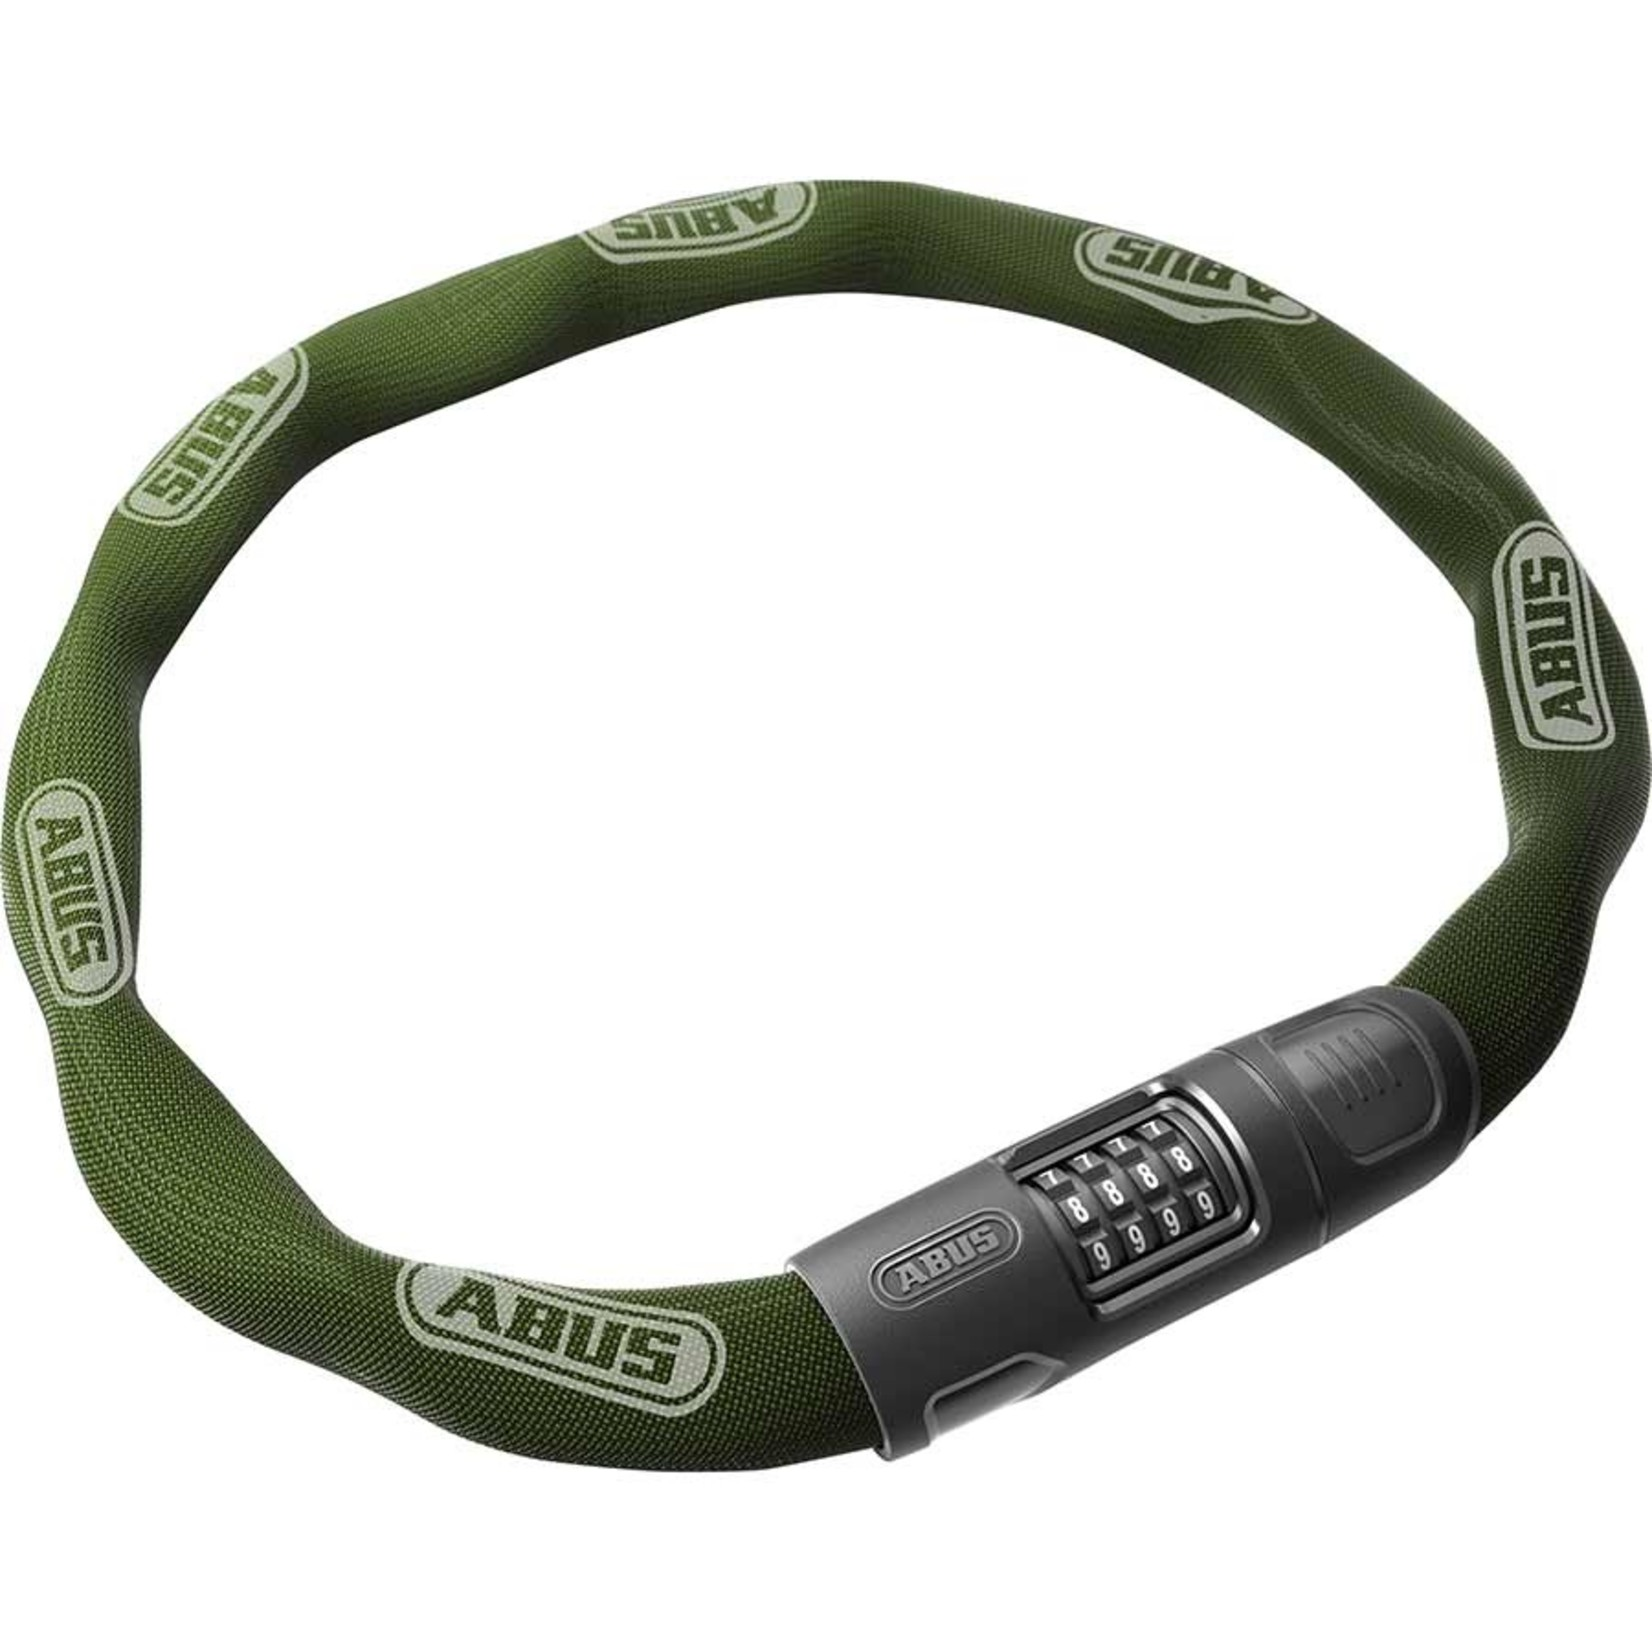 Abus Abus, 8808C, Chain Lock, Combination, 8mm